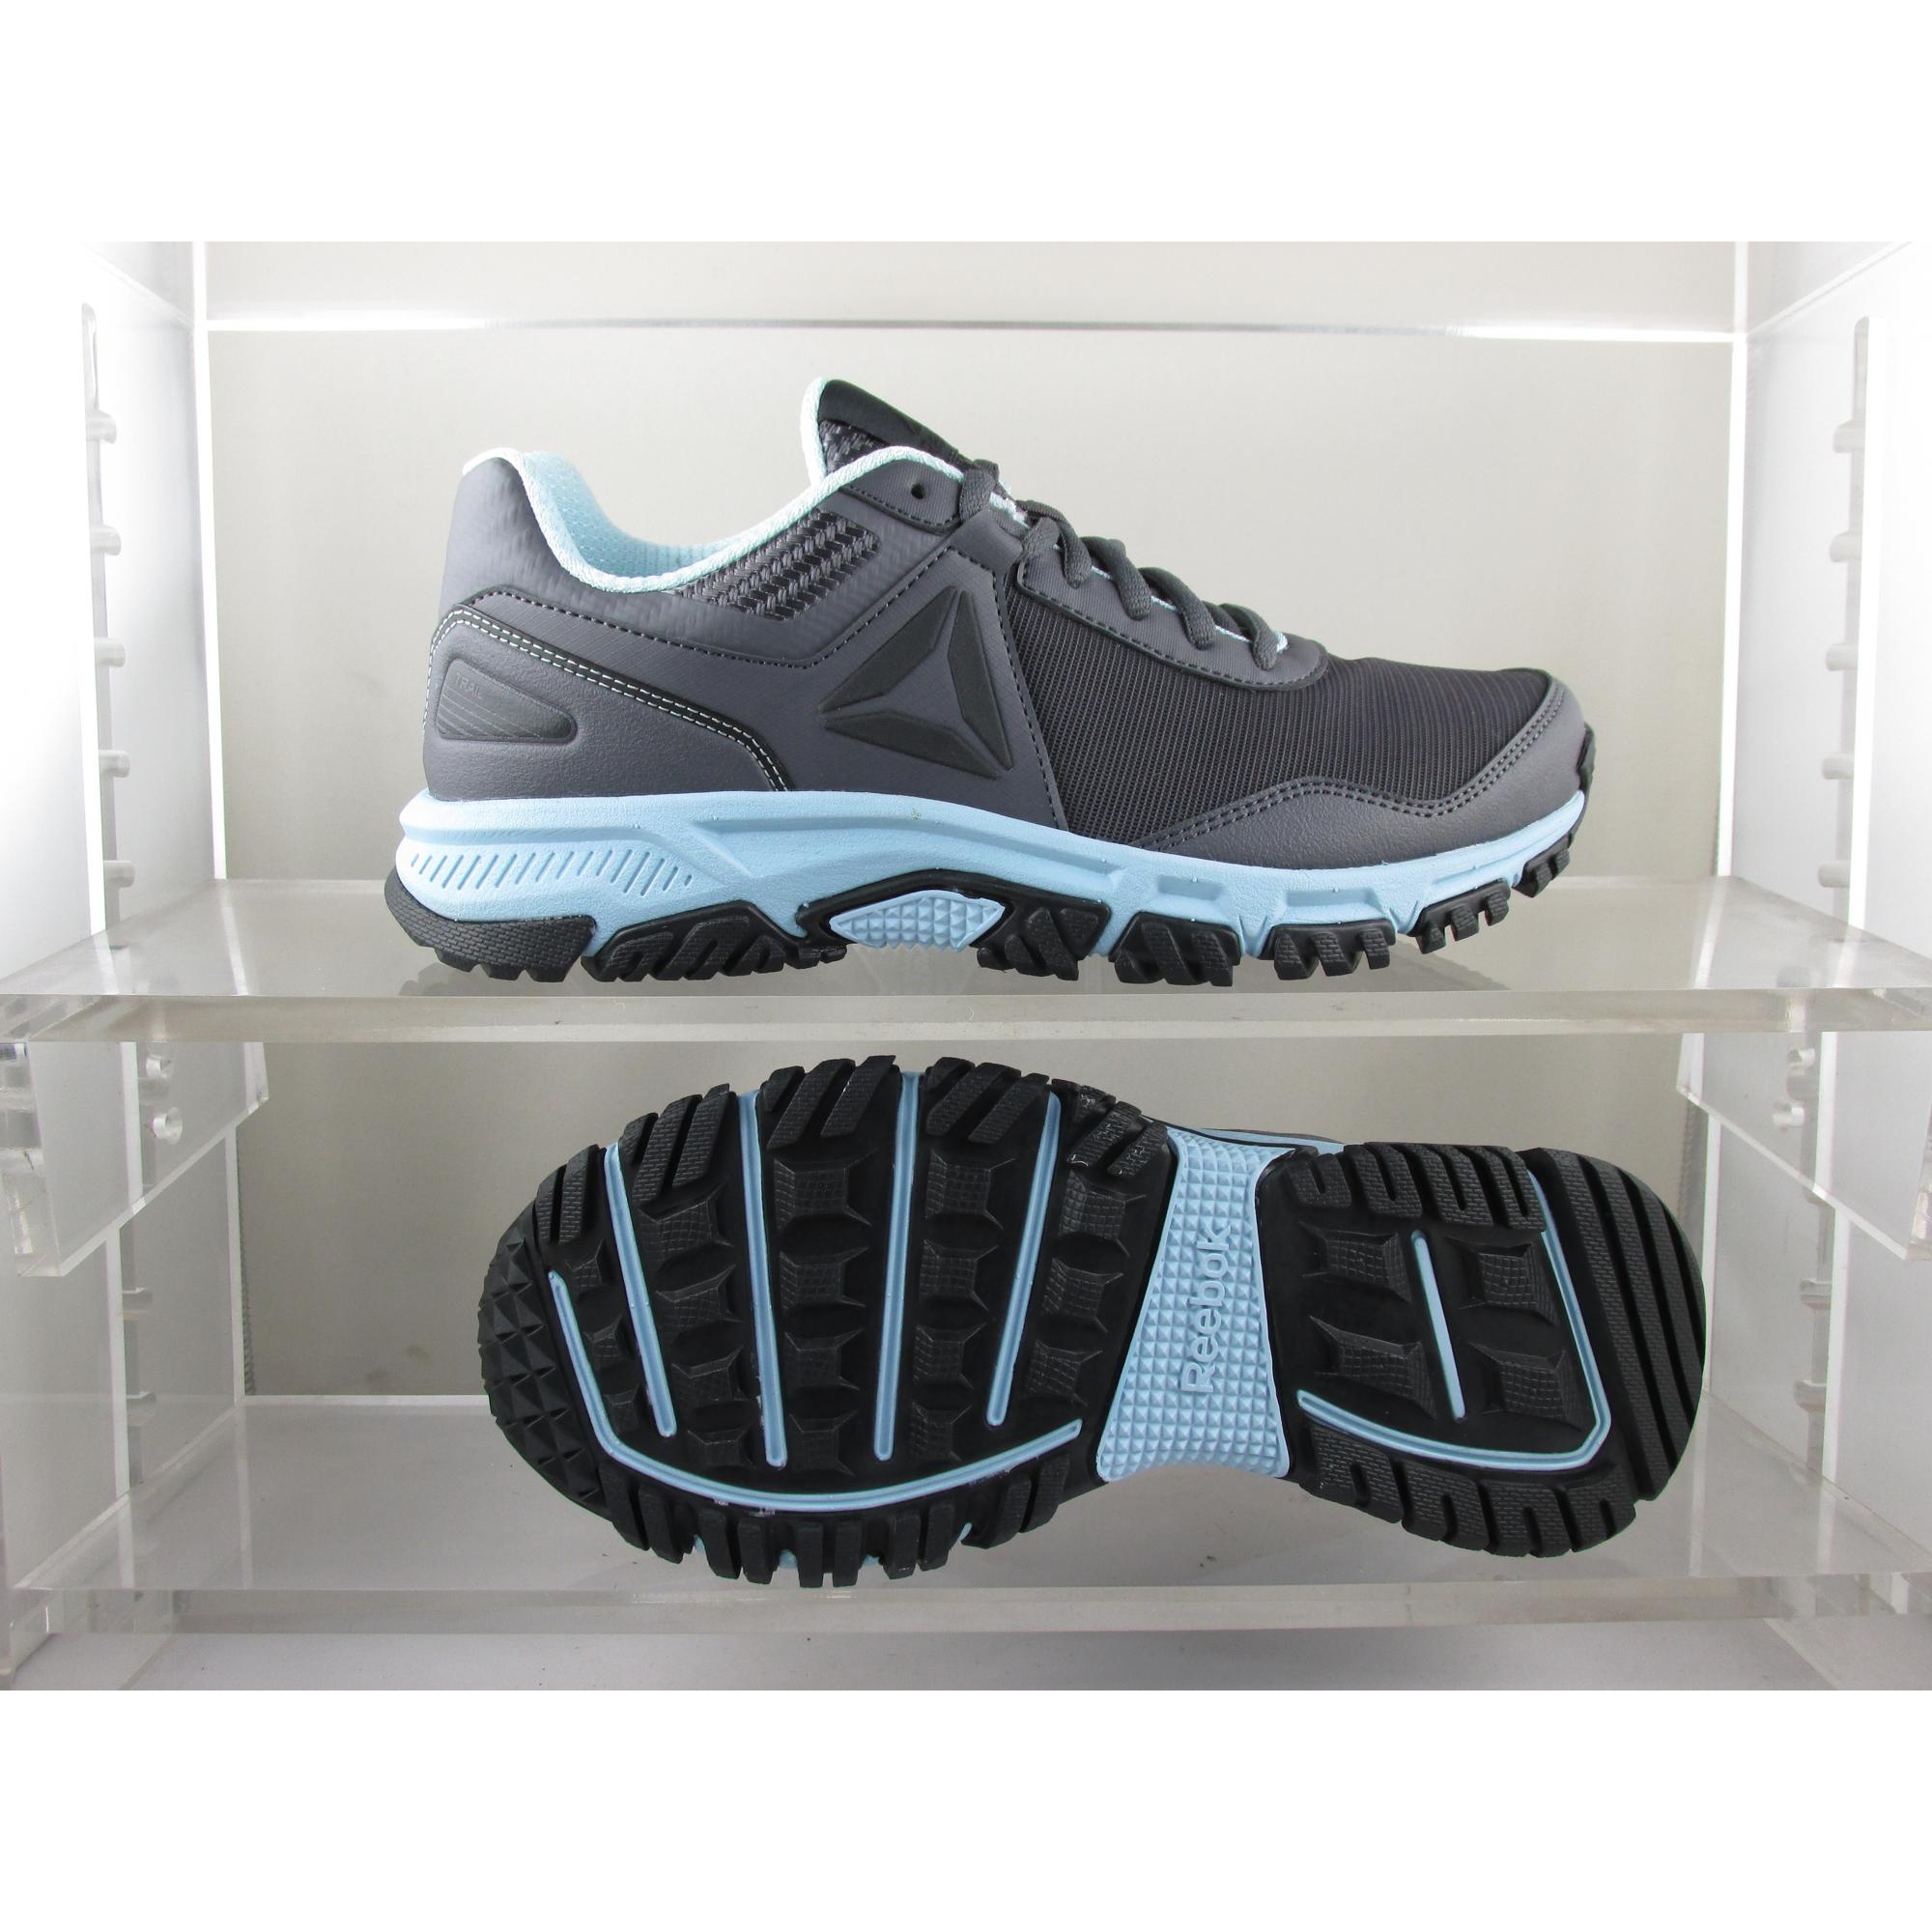 1019a58675dd4 Chaussures femme Reebok Ridgerider Trail 3.0